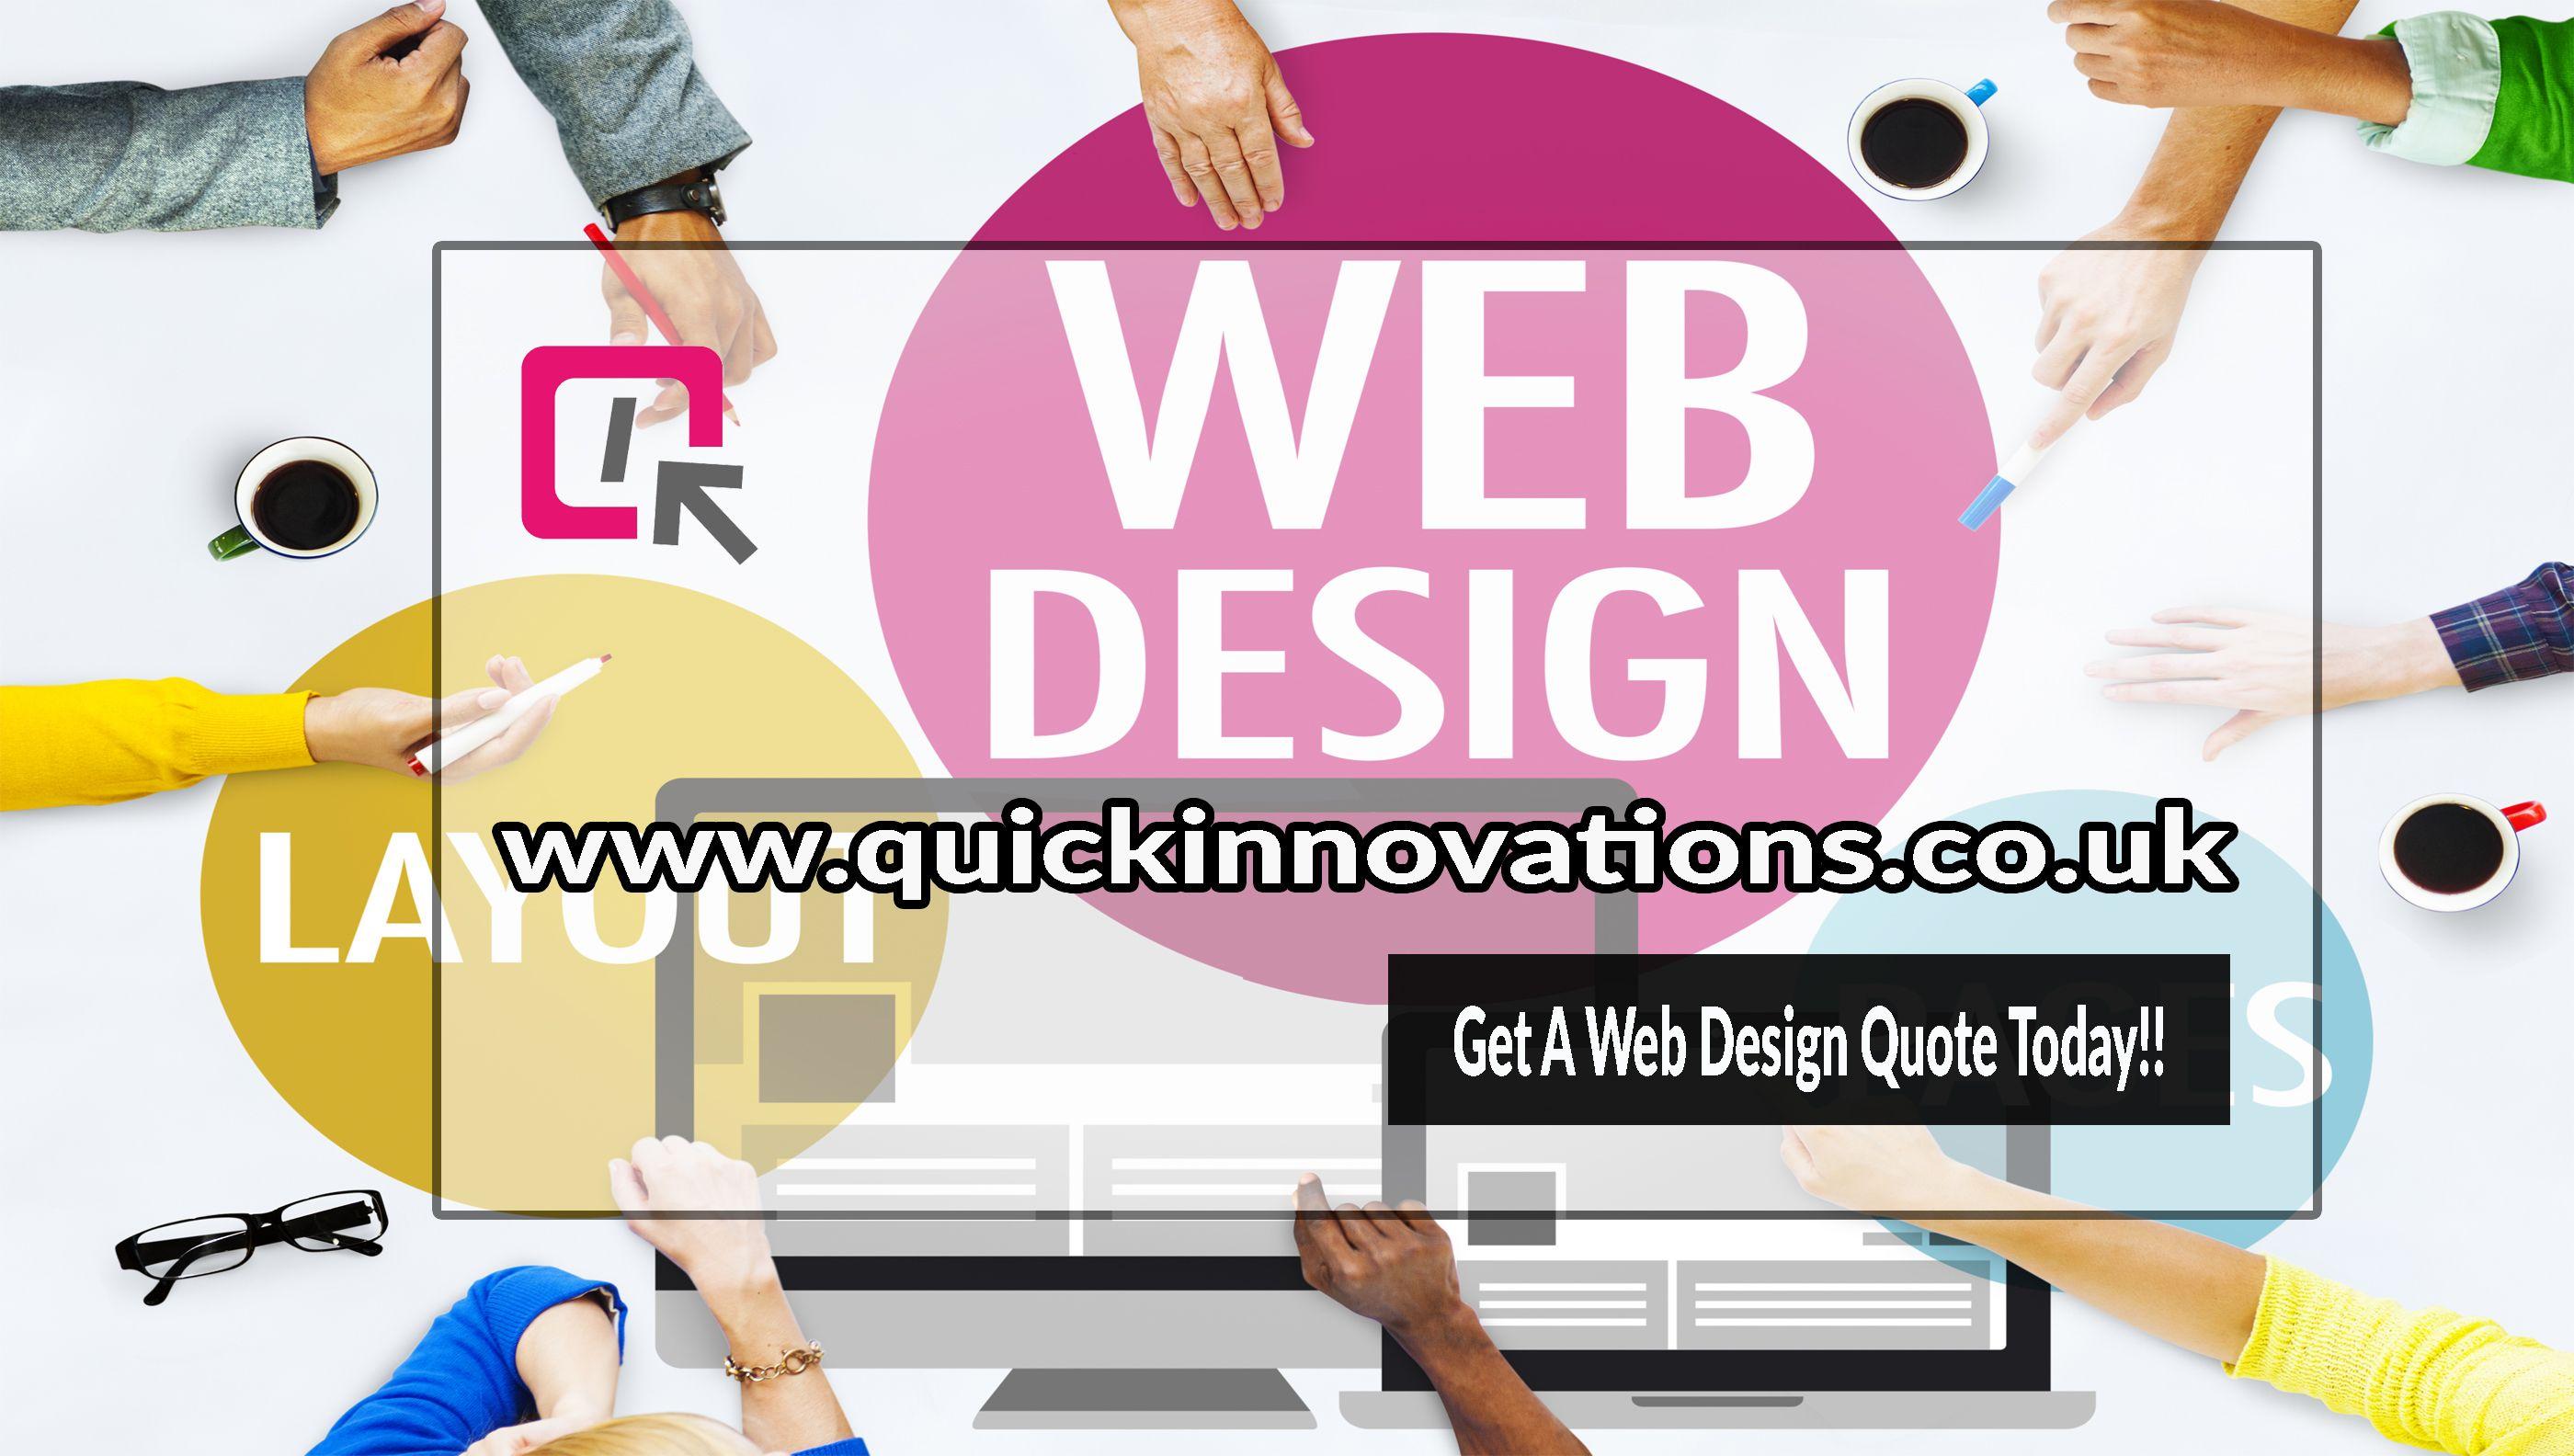 Web Design London Web Design Quotes Affordable Web Design Web Design